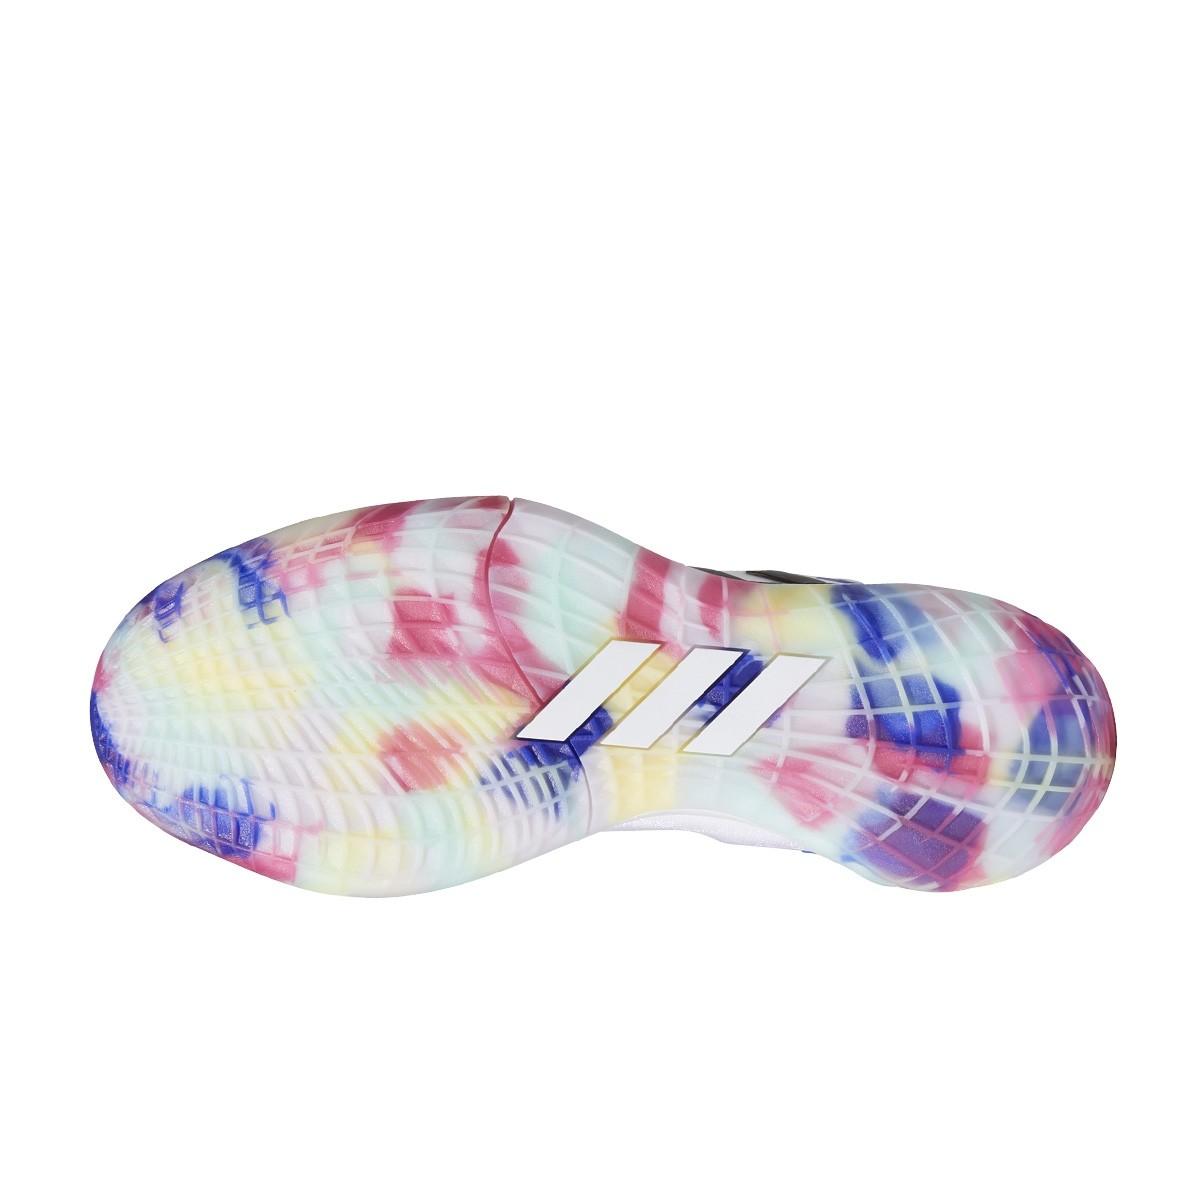 ADIDAS Harden Stepback 2 'Tie-dye Sole'-H68057